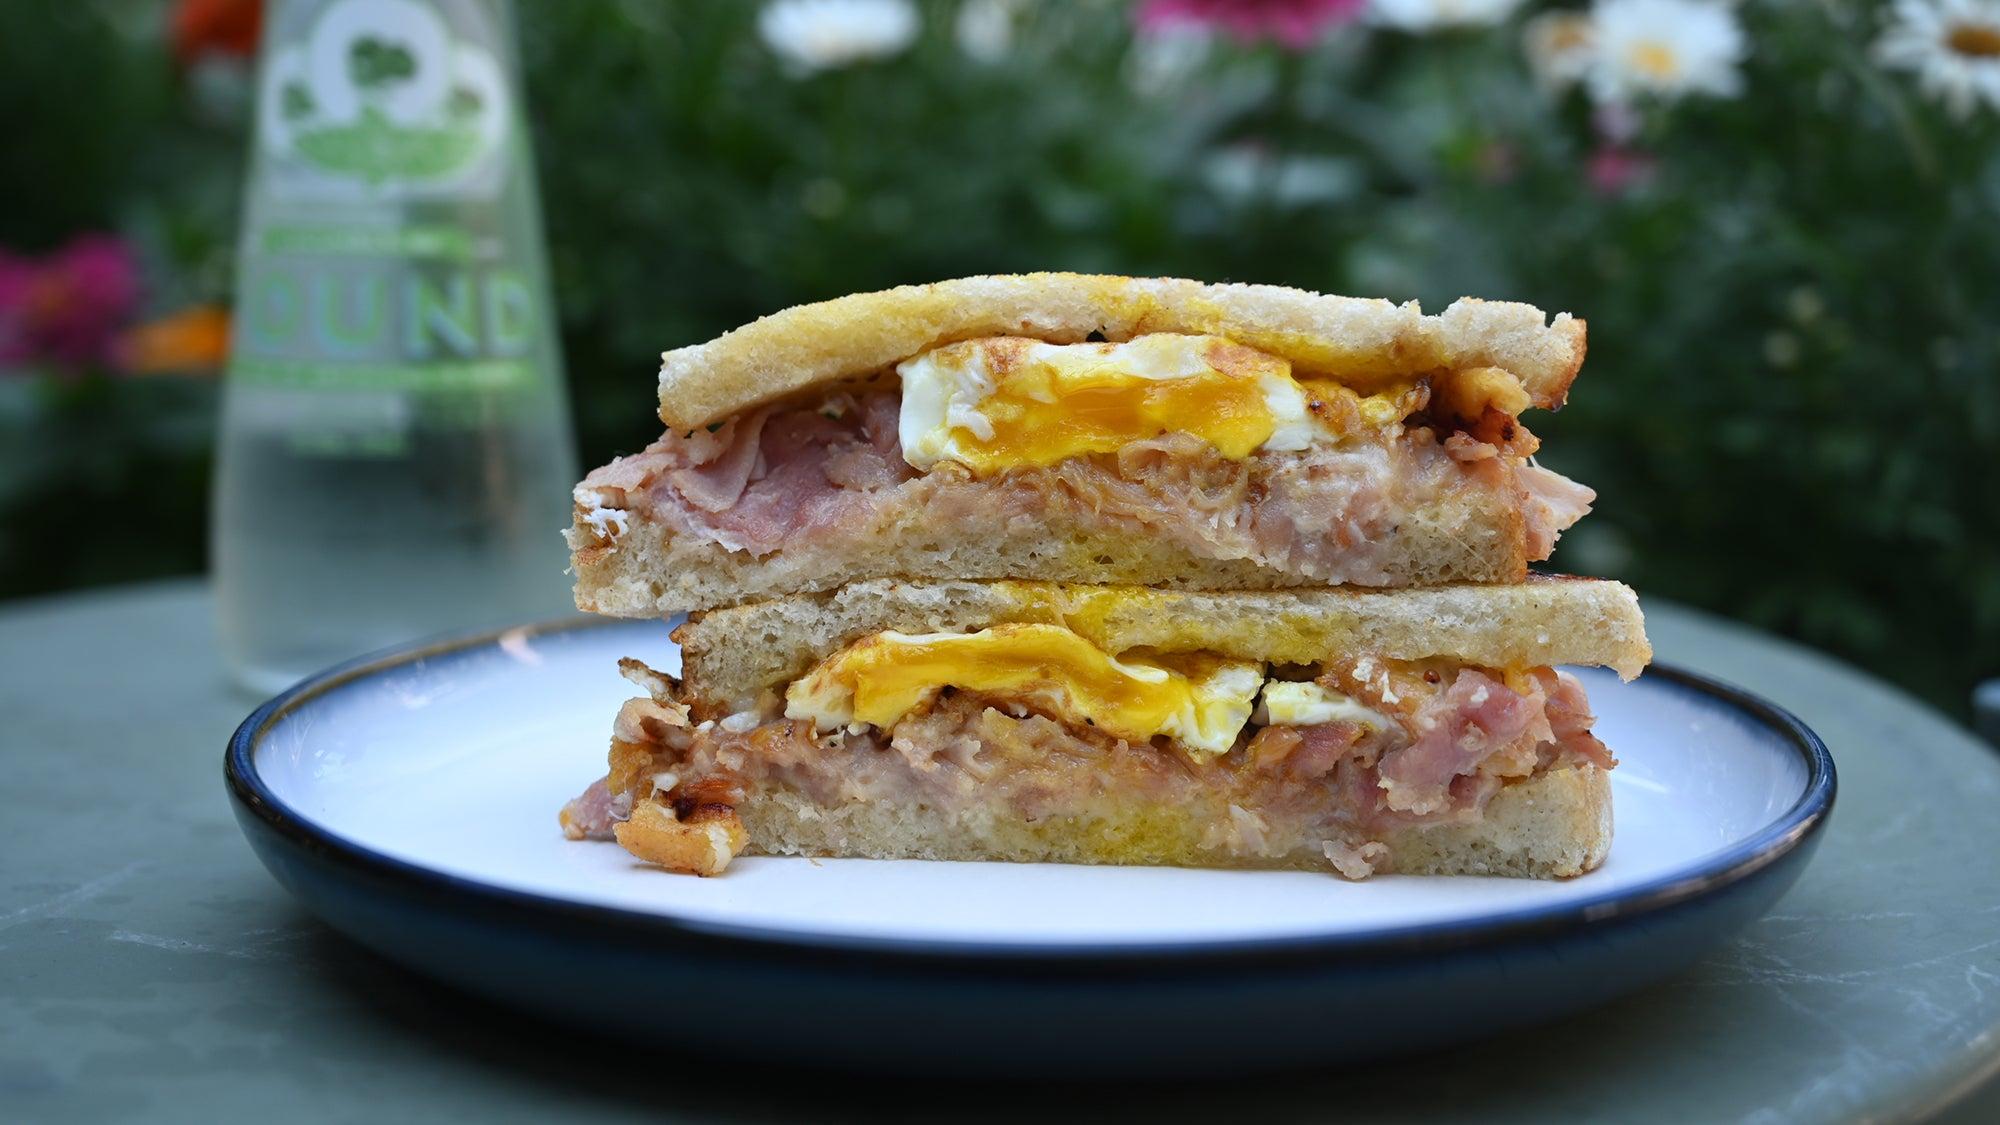 Breakfast sandwich at Mike & Patty's